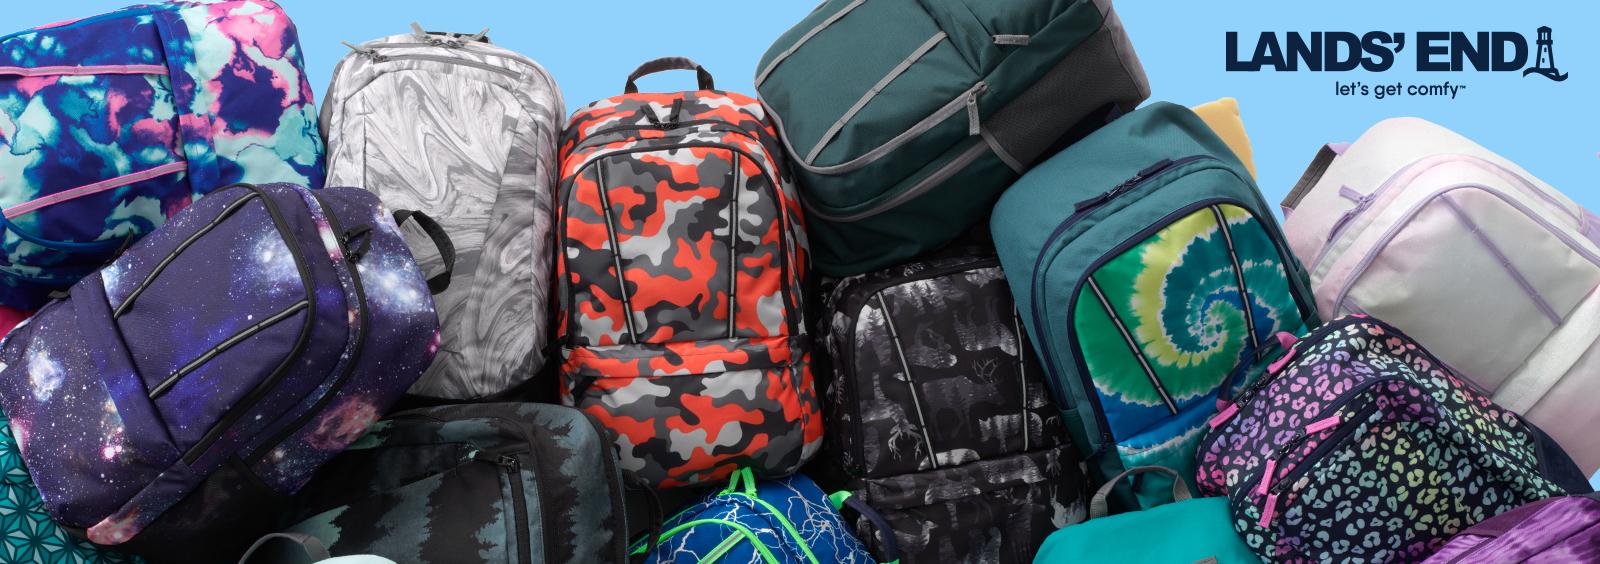 Best Schoolbags to Start the School Year